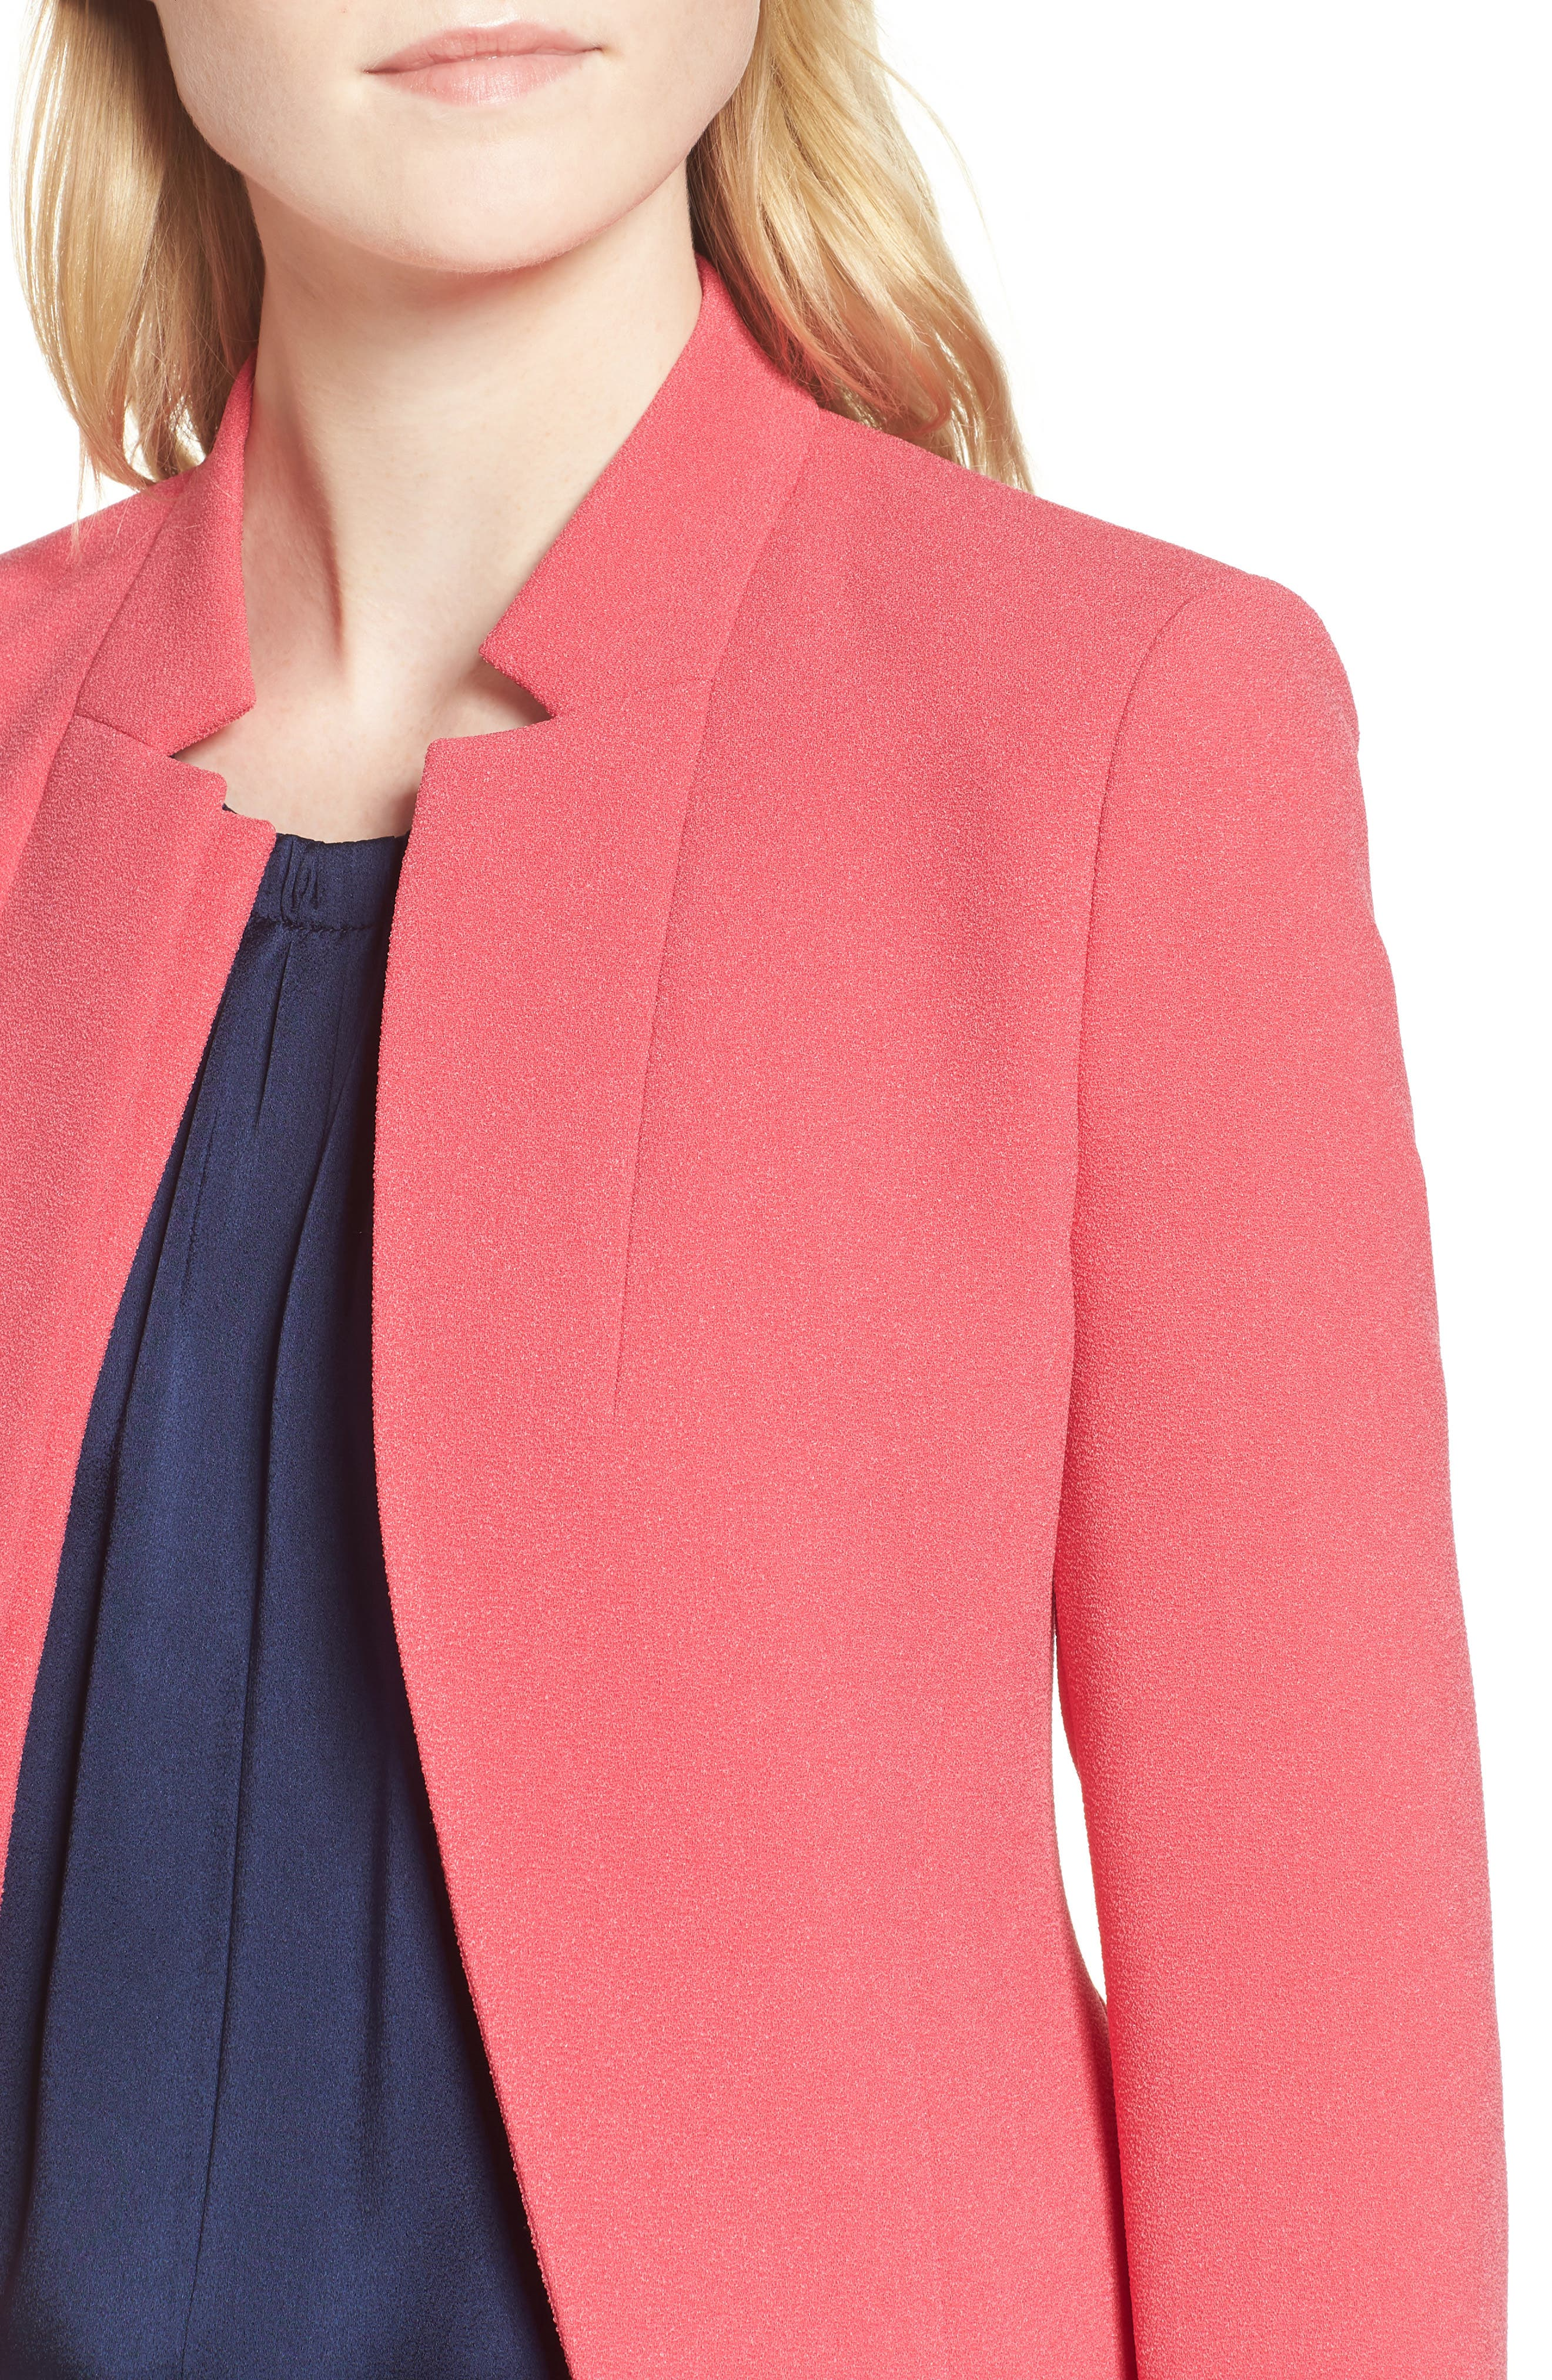 Jisala Compact Crepe Crop Jacket,                             Alternate thumbnail 4, color,                             Lychee Pink